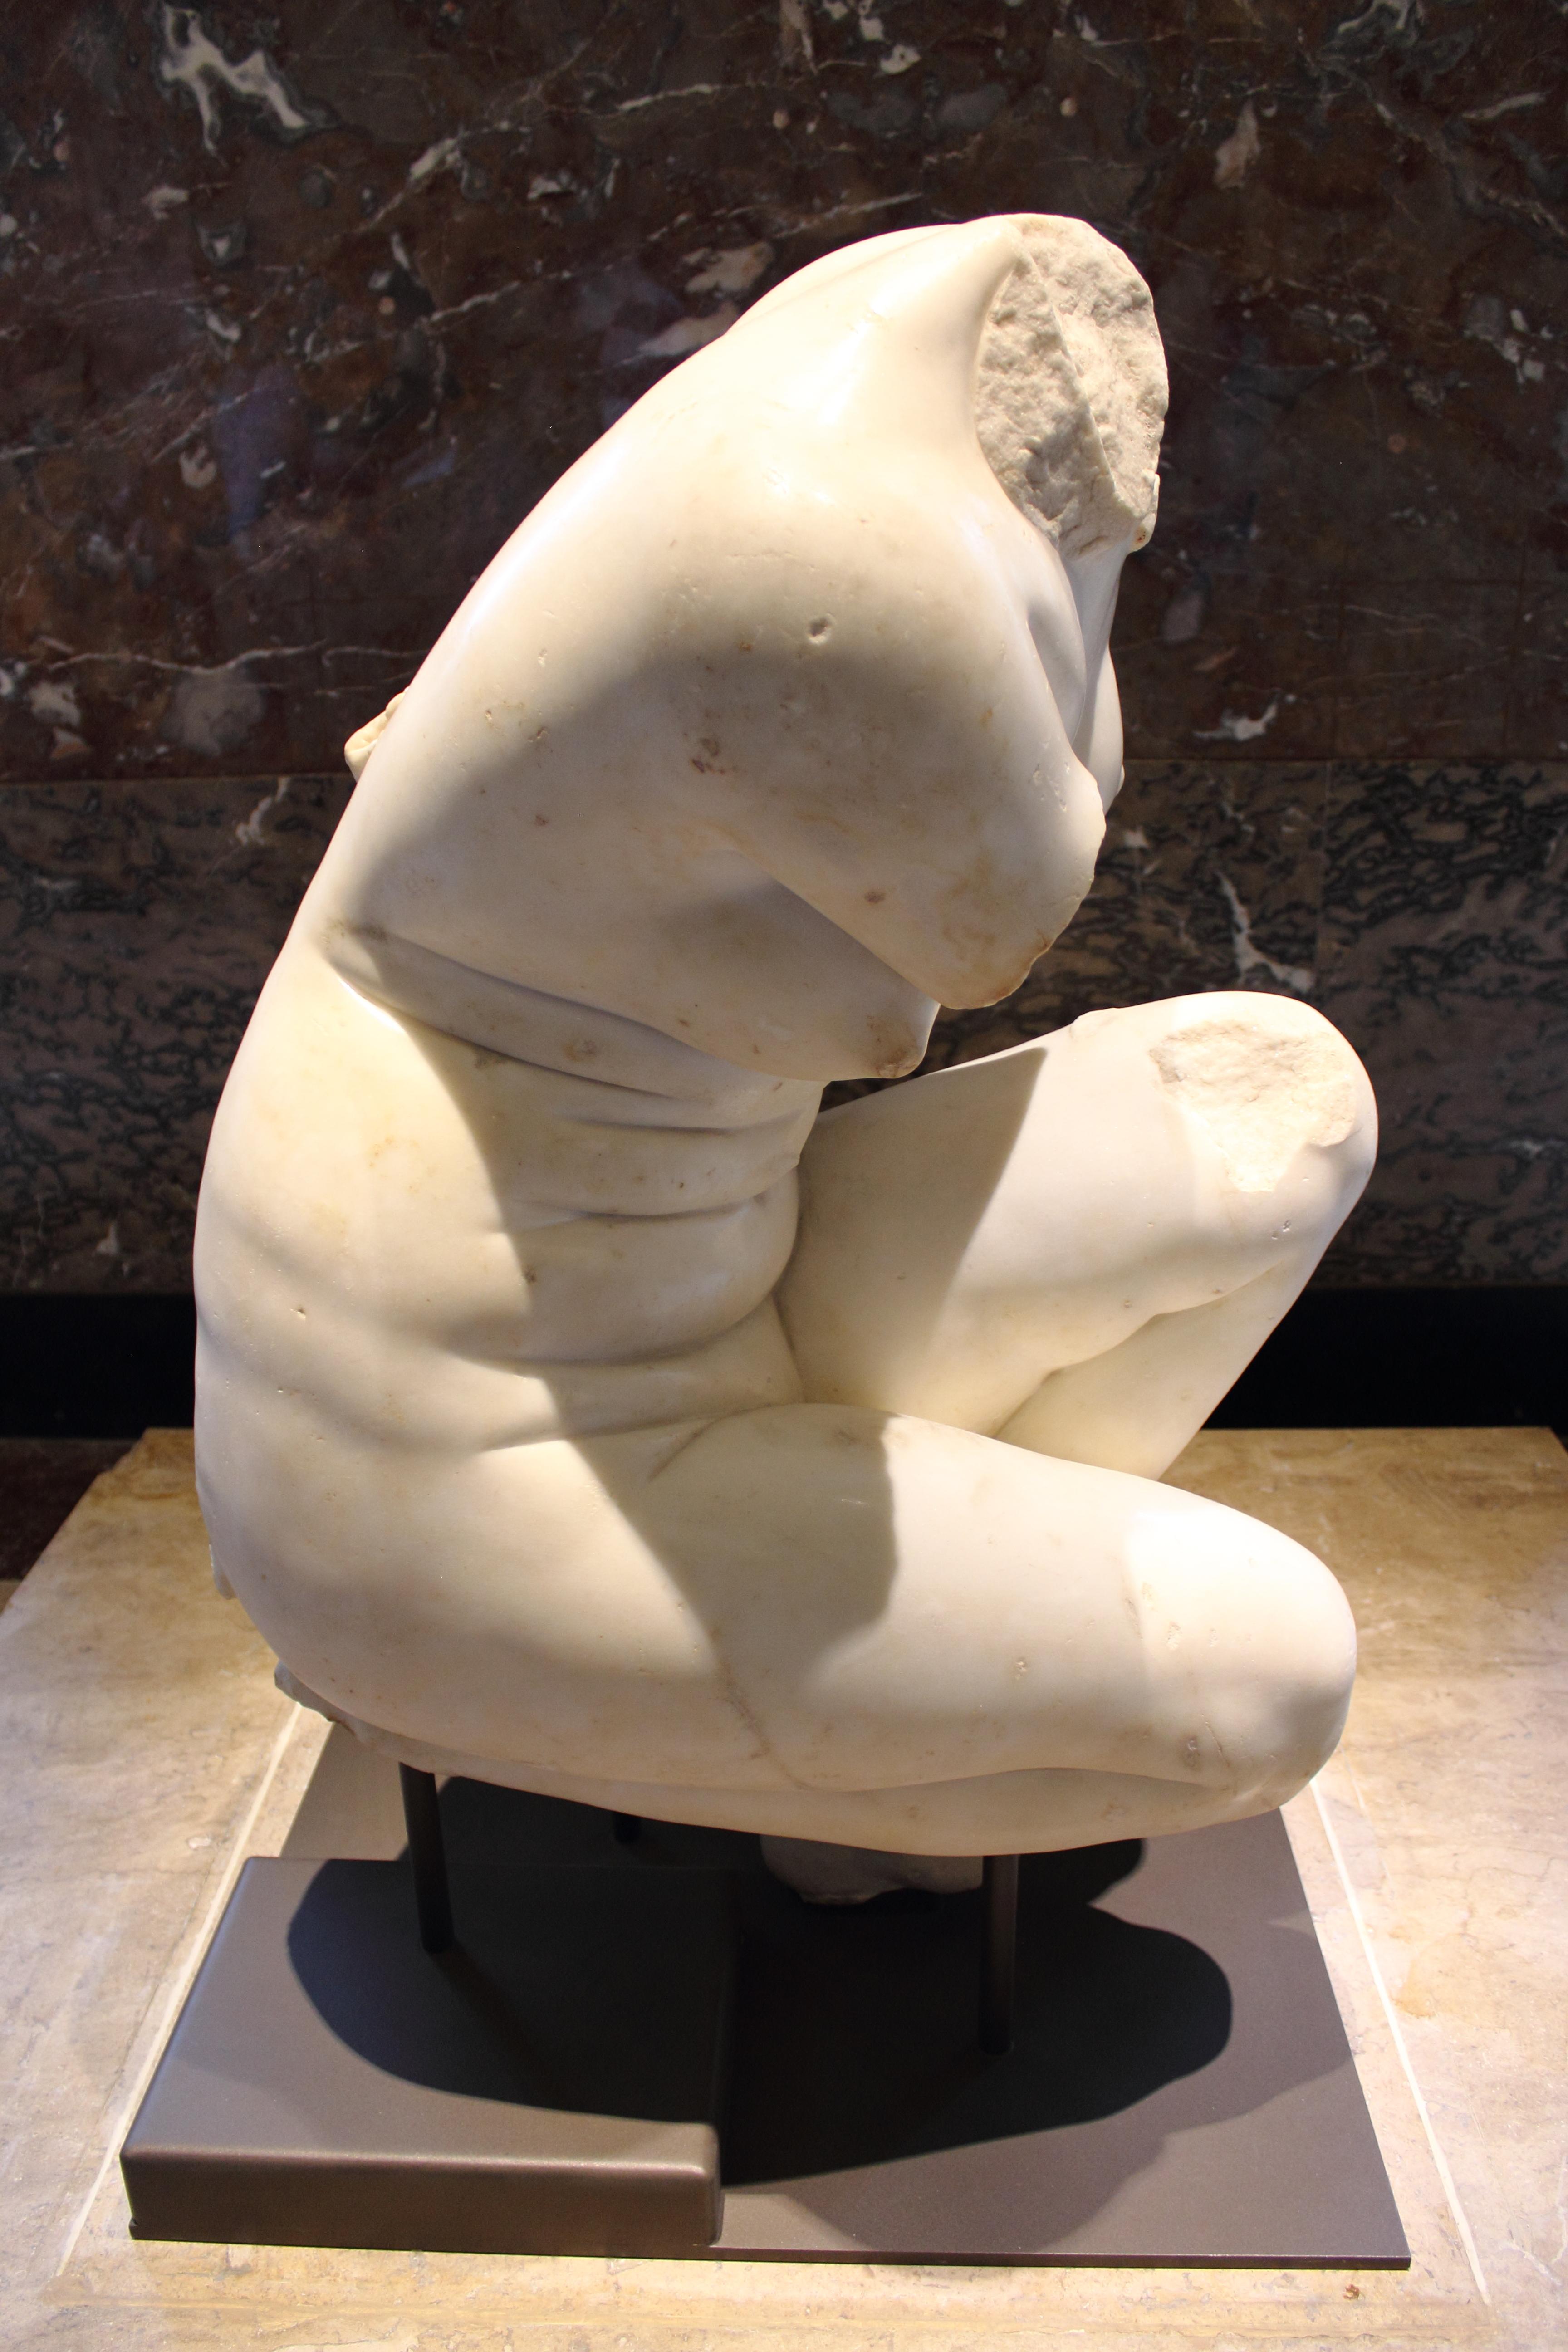 Kneeling Aphrodite at the Louvre, Aspasía S. Bissas